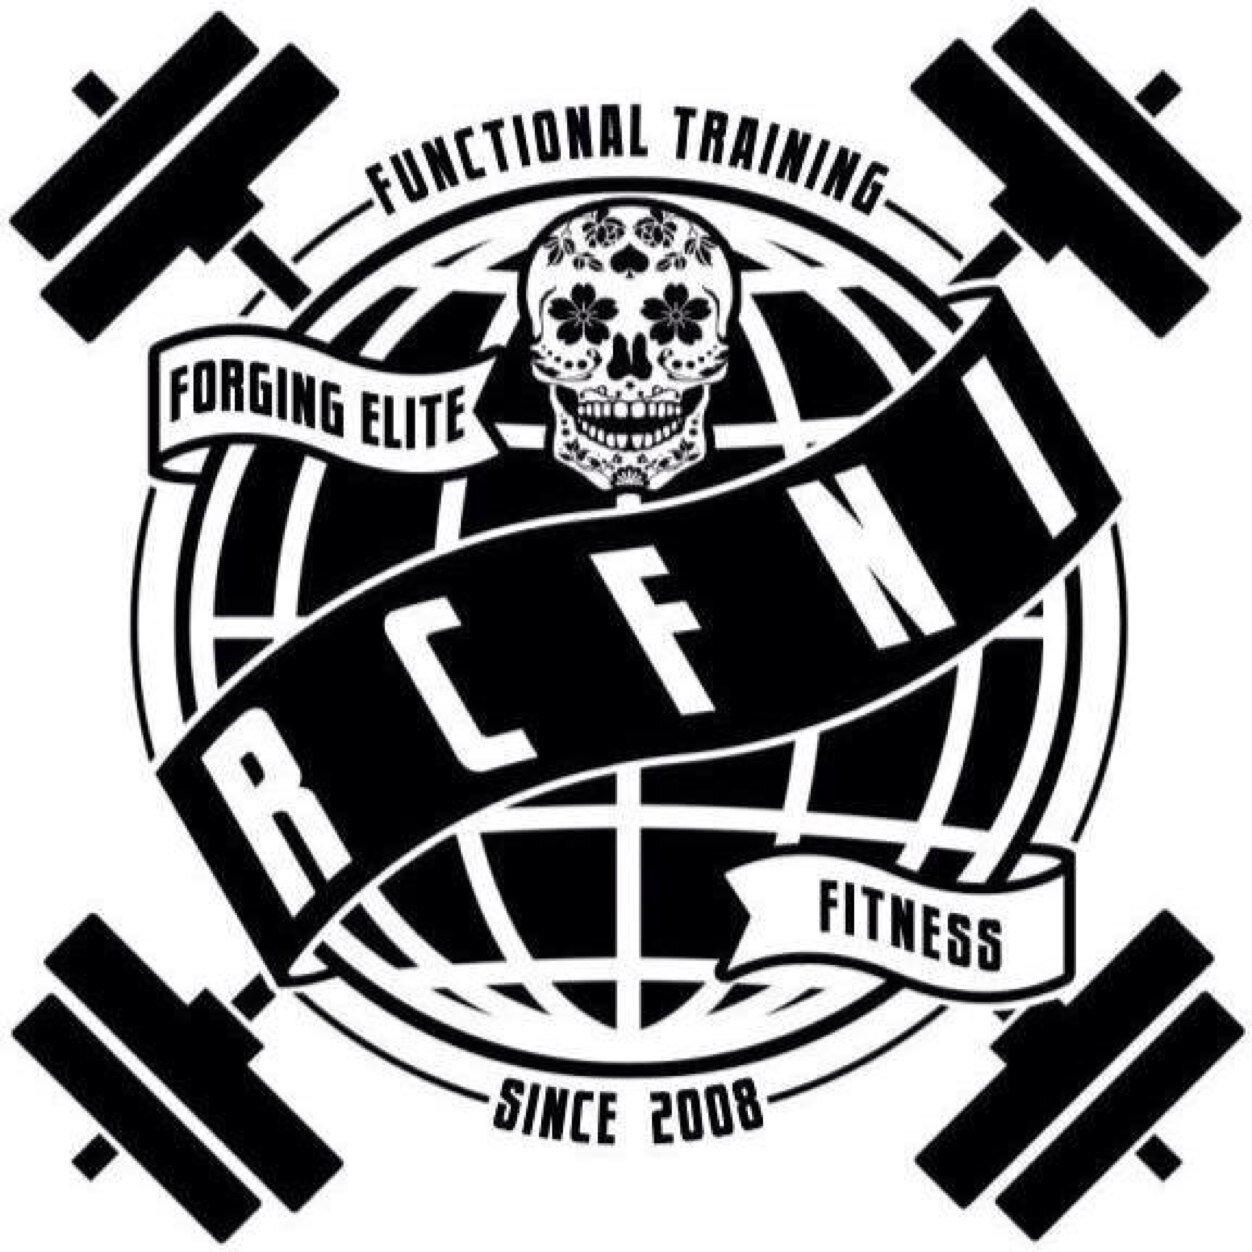 Reebok CrossFit NI (@RCFNI).